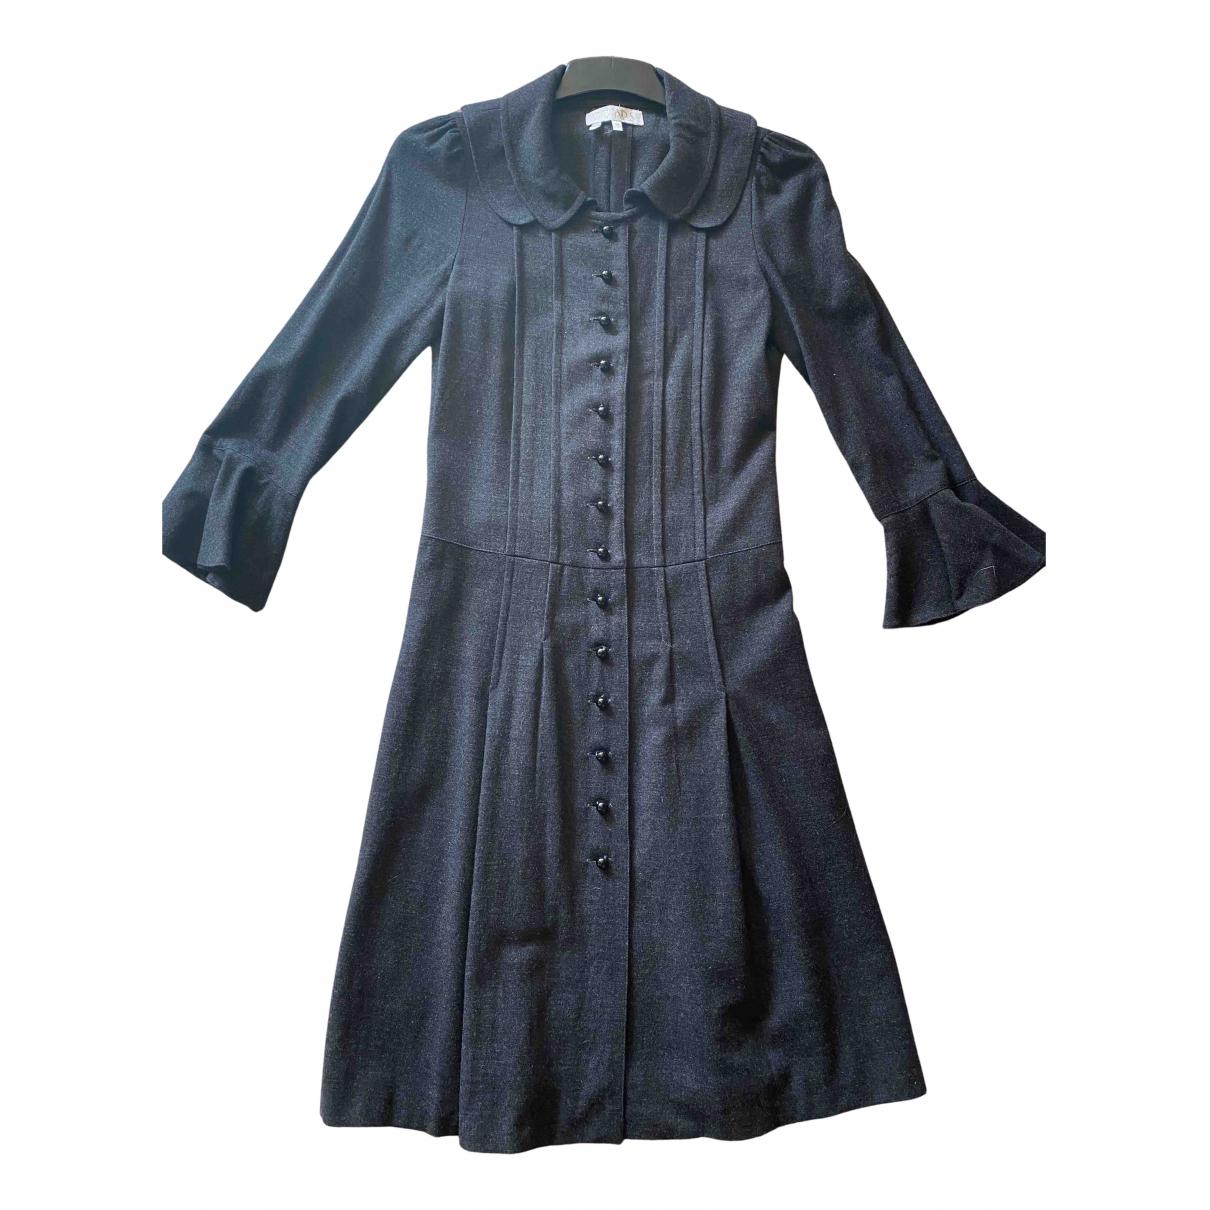 Escada N Anthracite Wool dress for Women S International